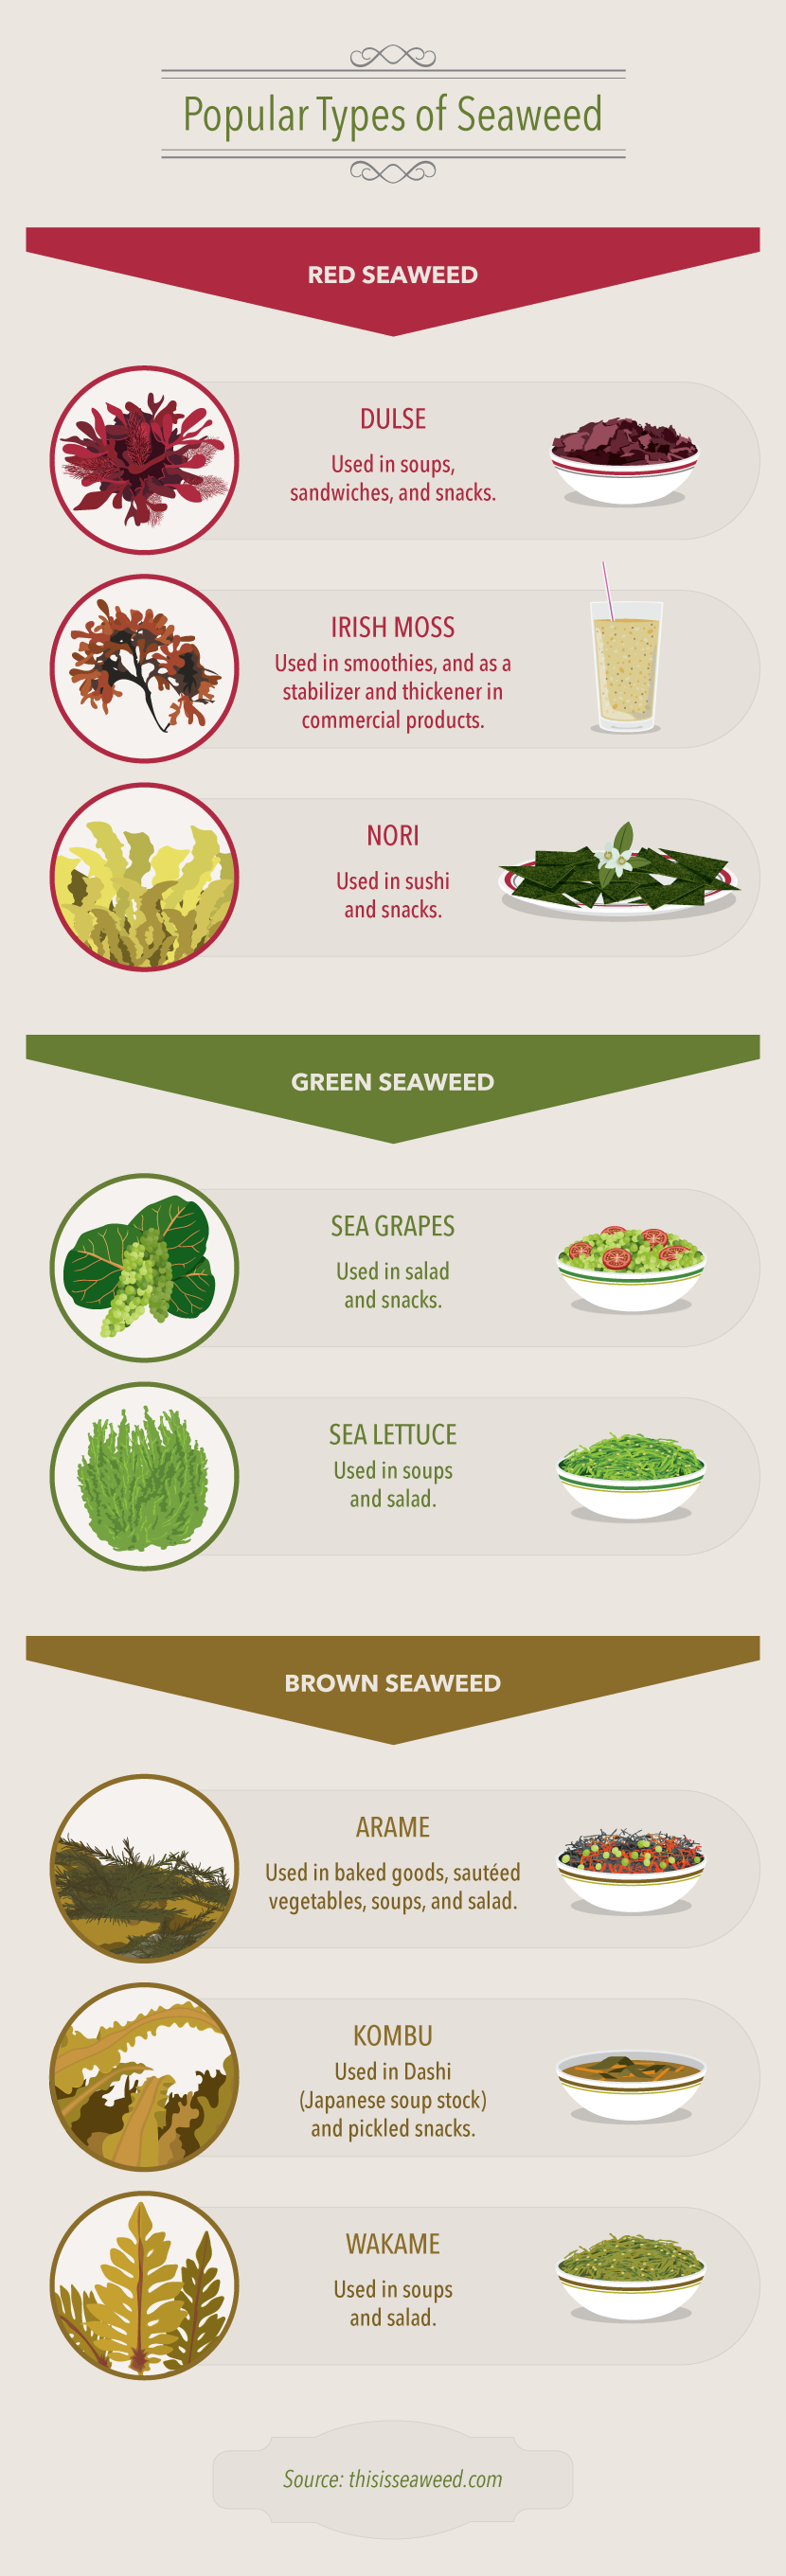 Popular Seaweed Types - A Guide to Eating Seaweed